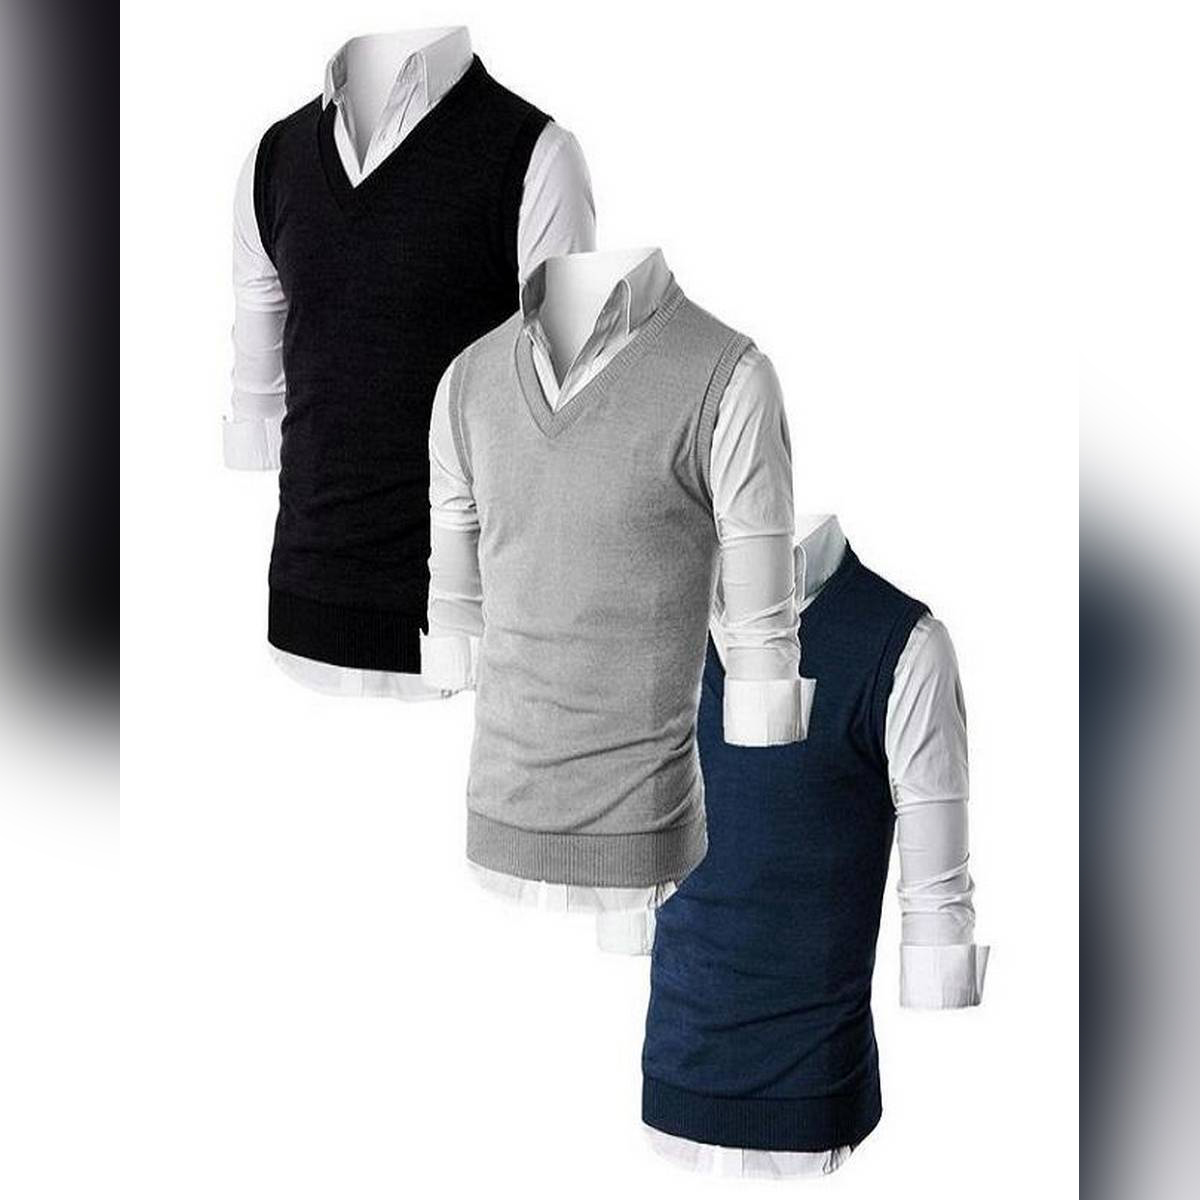 Pack Of 3 – Multicolor Fleece Half Sleeves Sweater For Men